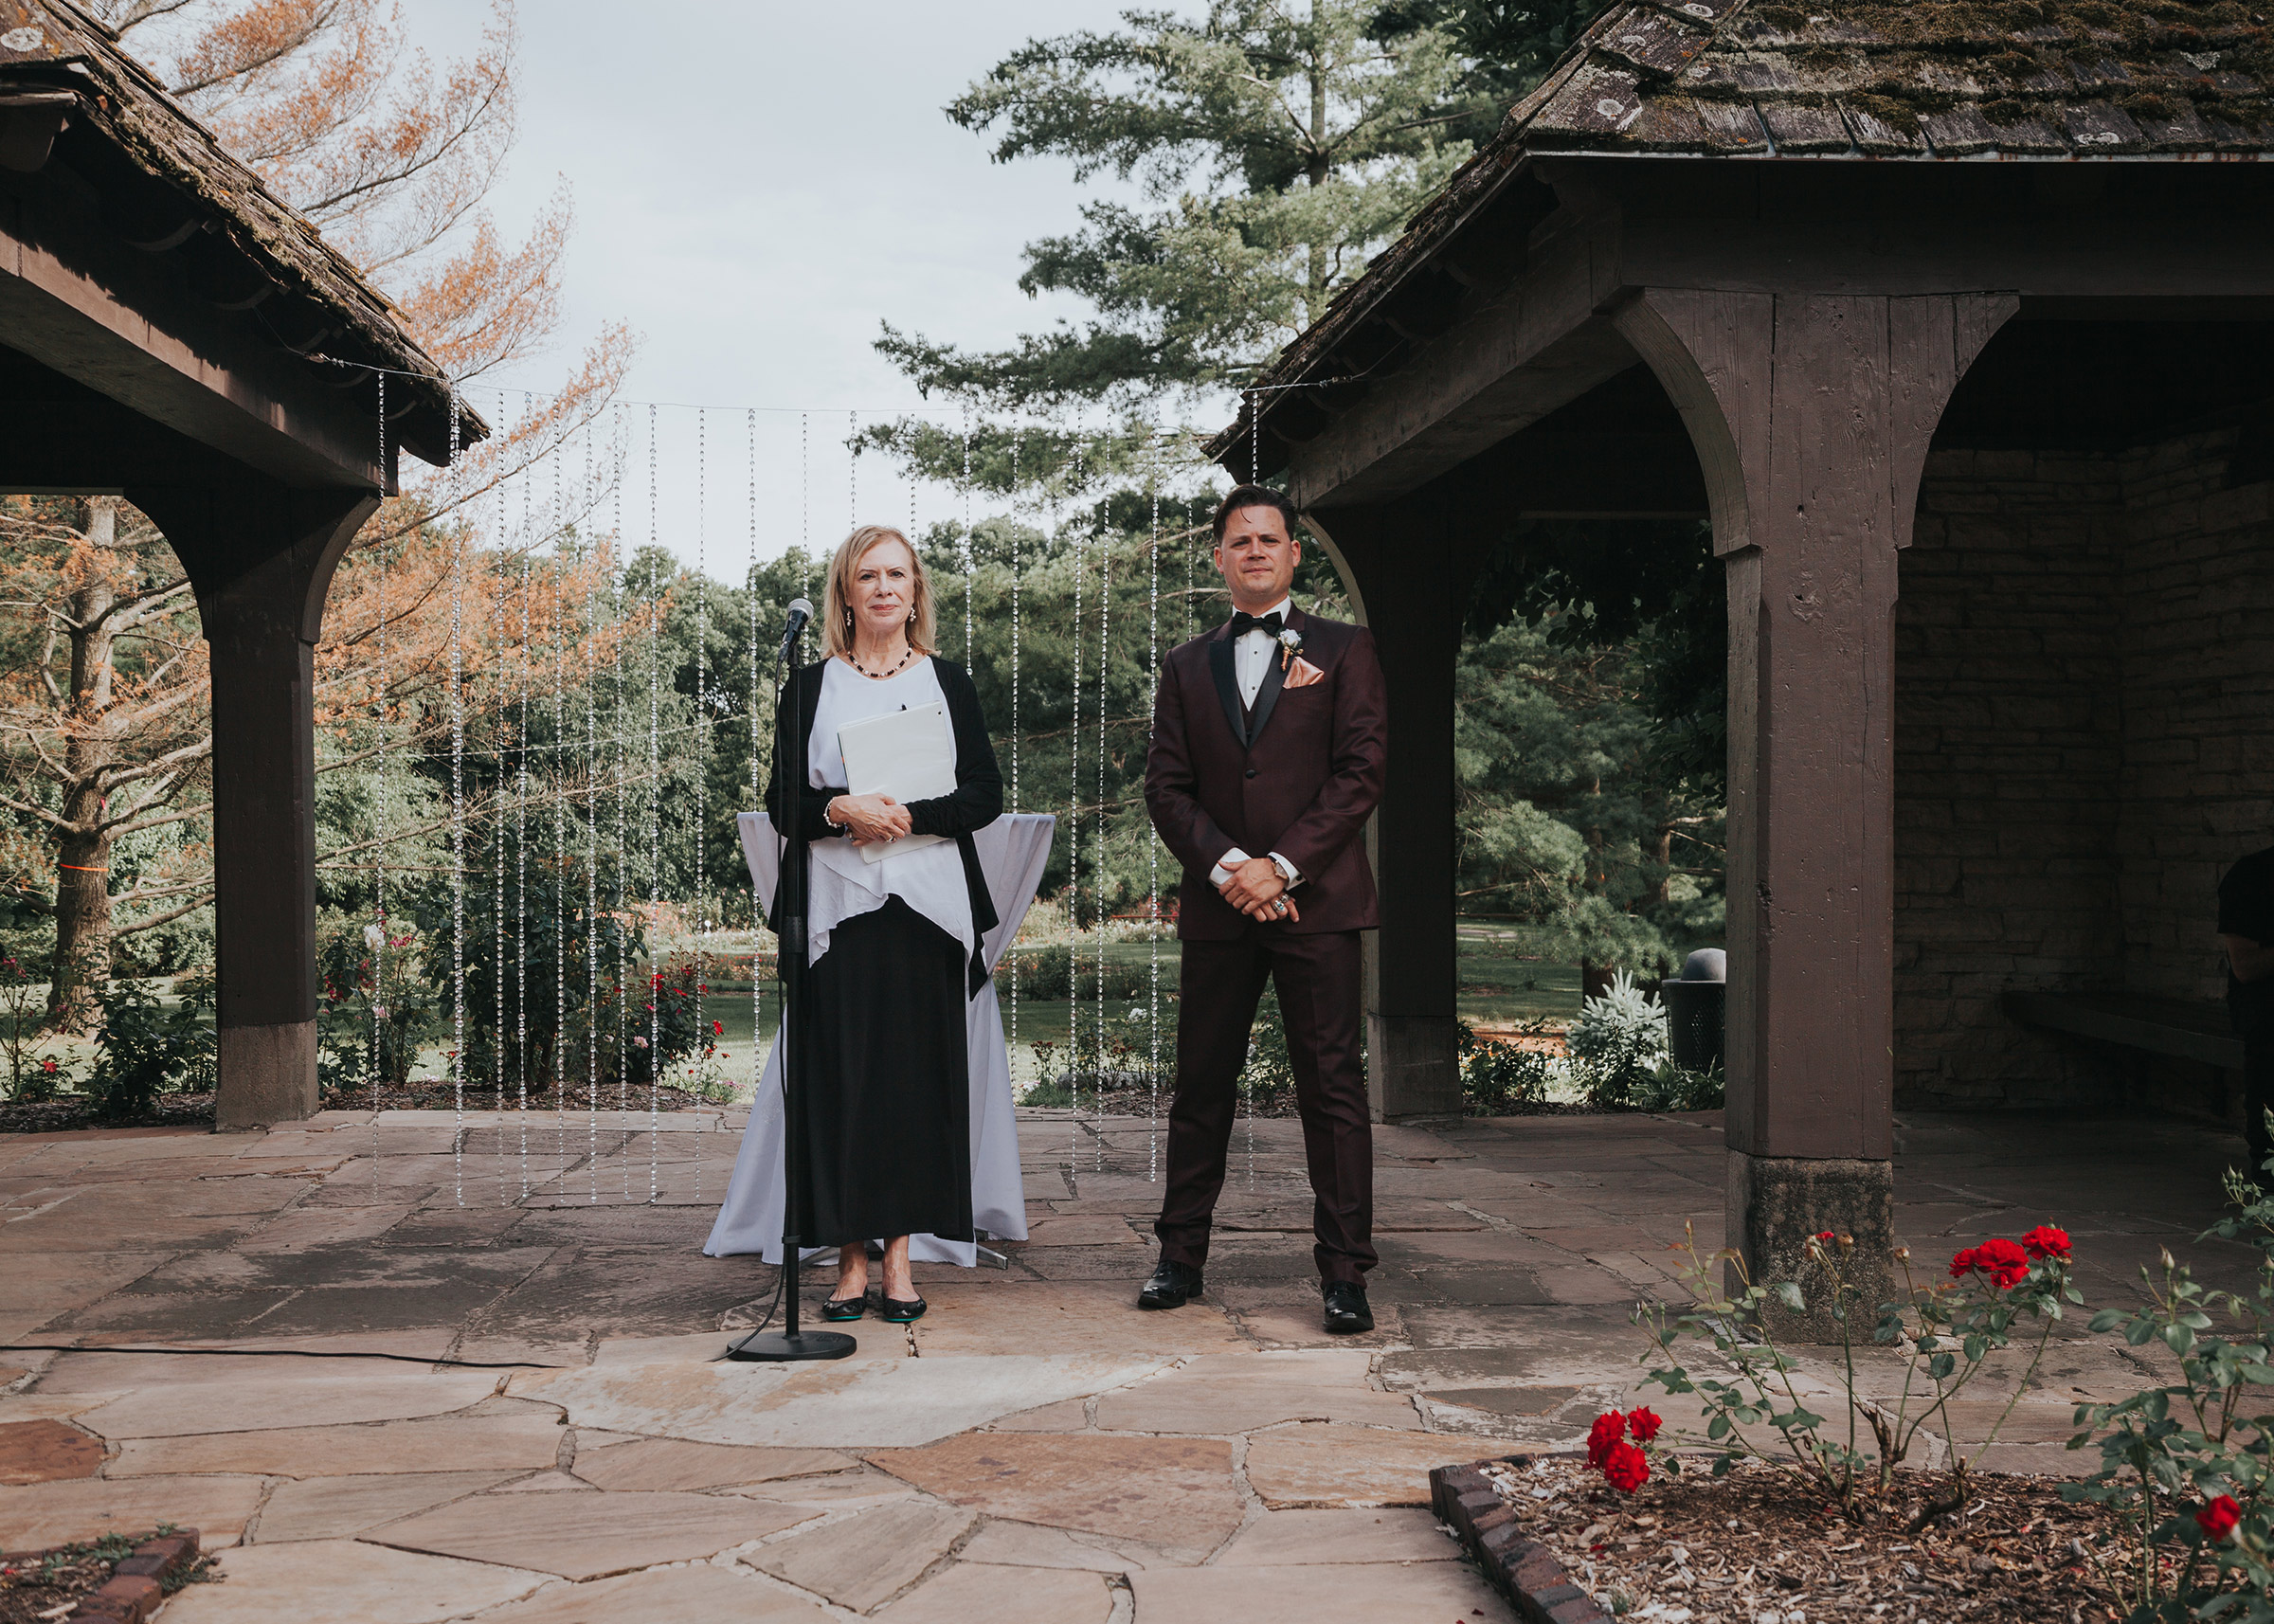 groom-waiting-for-bride-to-walk-down-aisle-desmoines-iowa-rose-garden-raelyn-ramey-photography.jpg